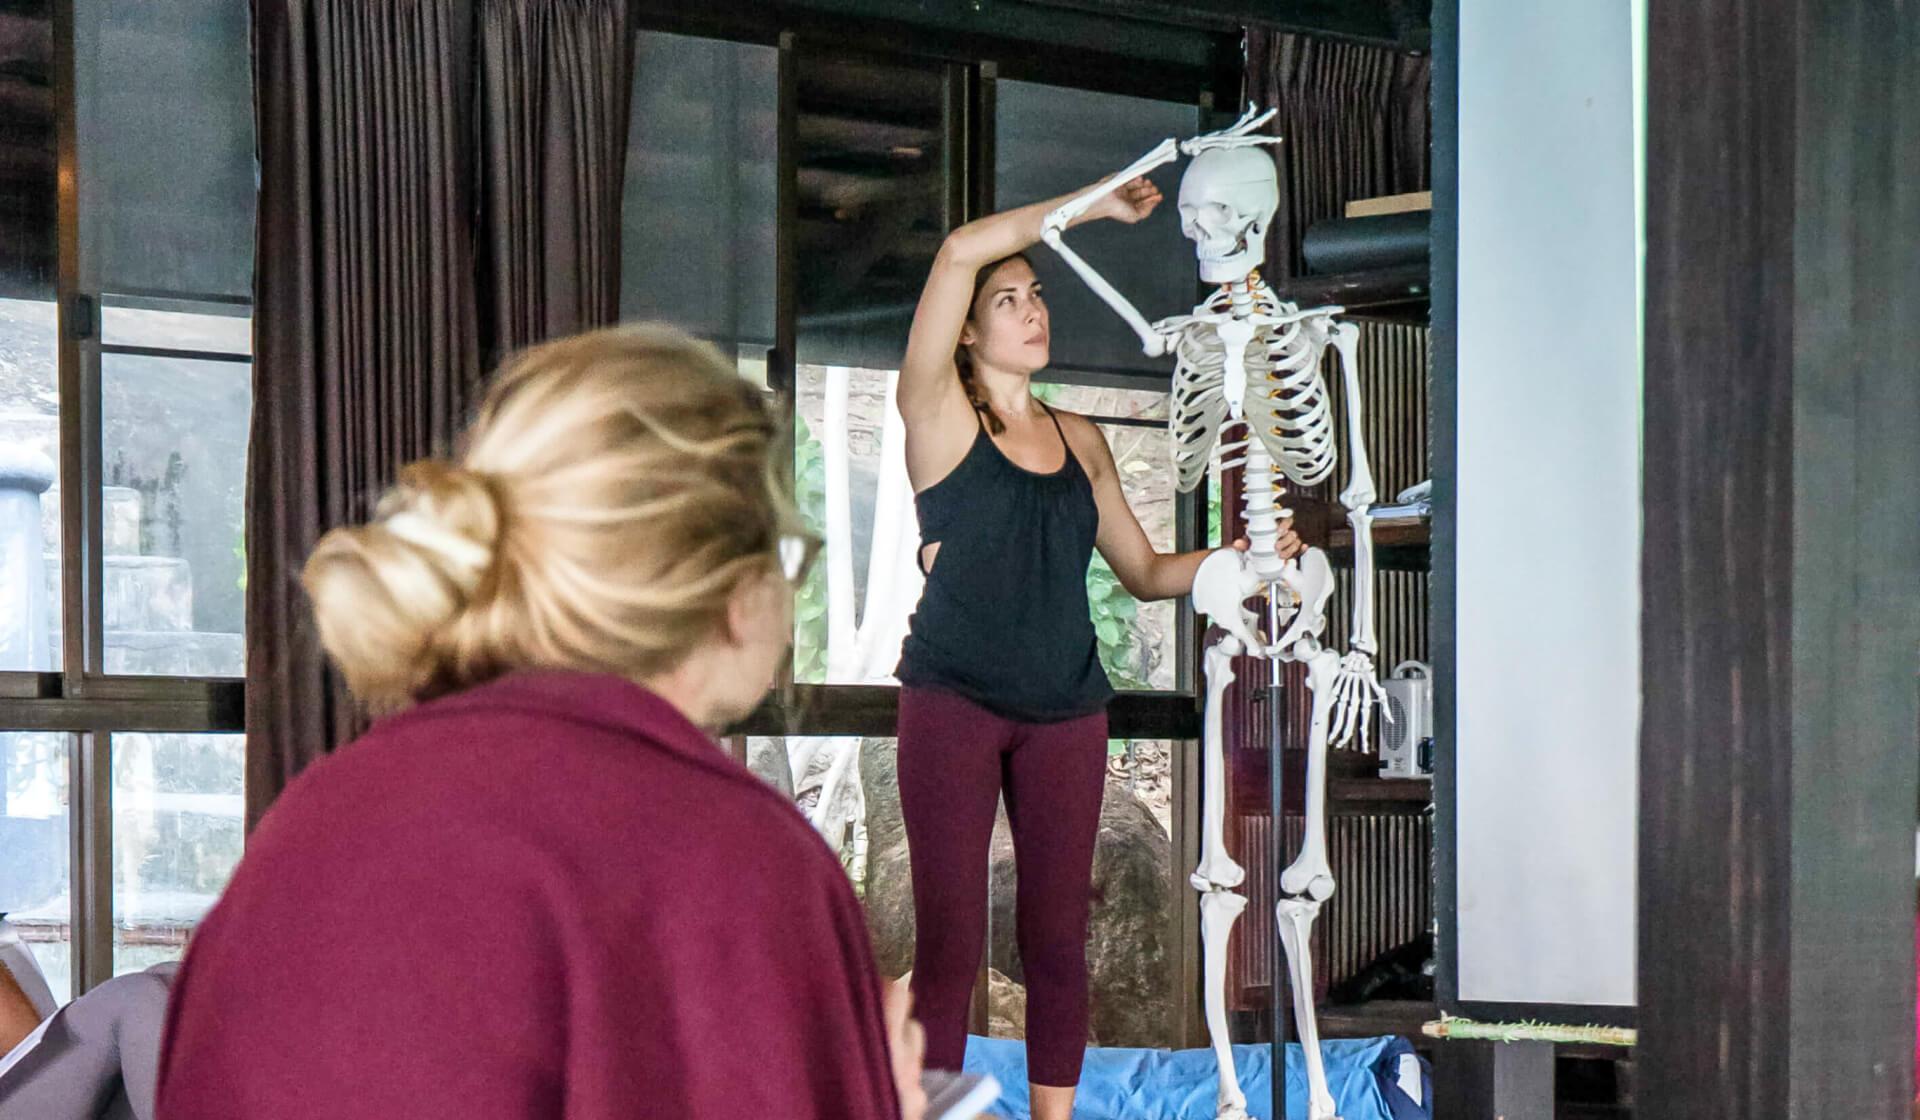 Yoga teacher trainer teaching anatomy while moving an anatomy skeleton as students take notes